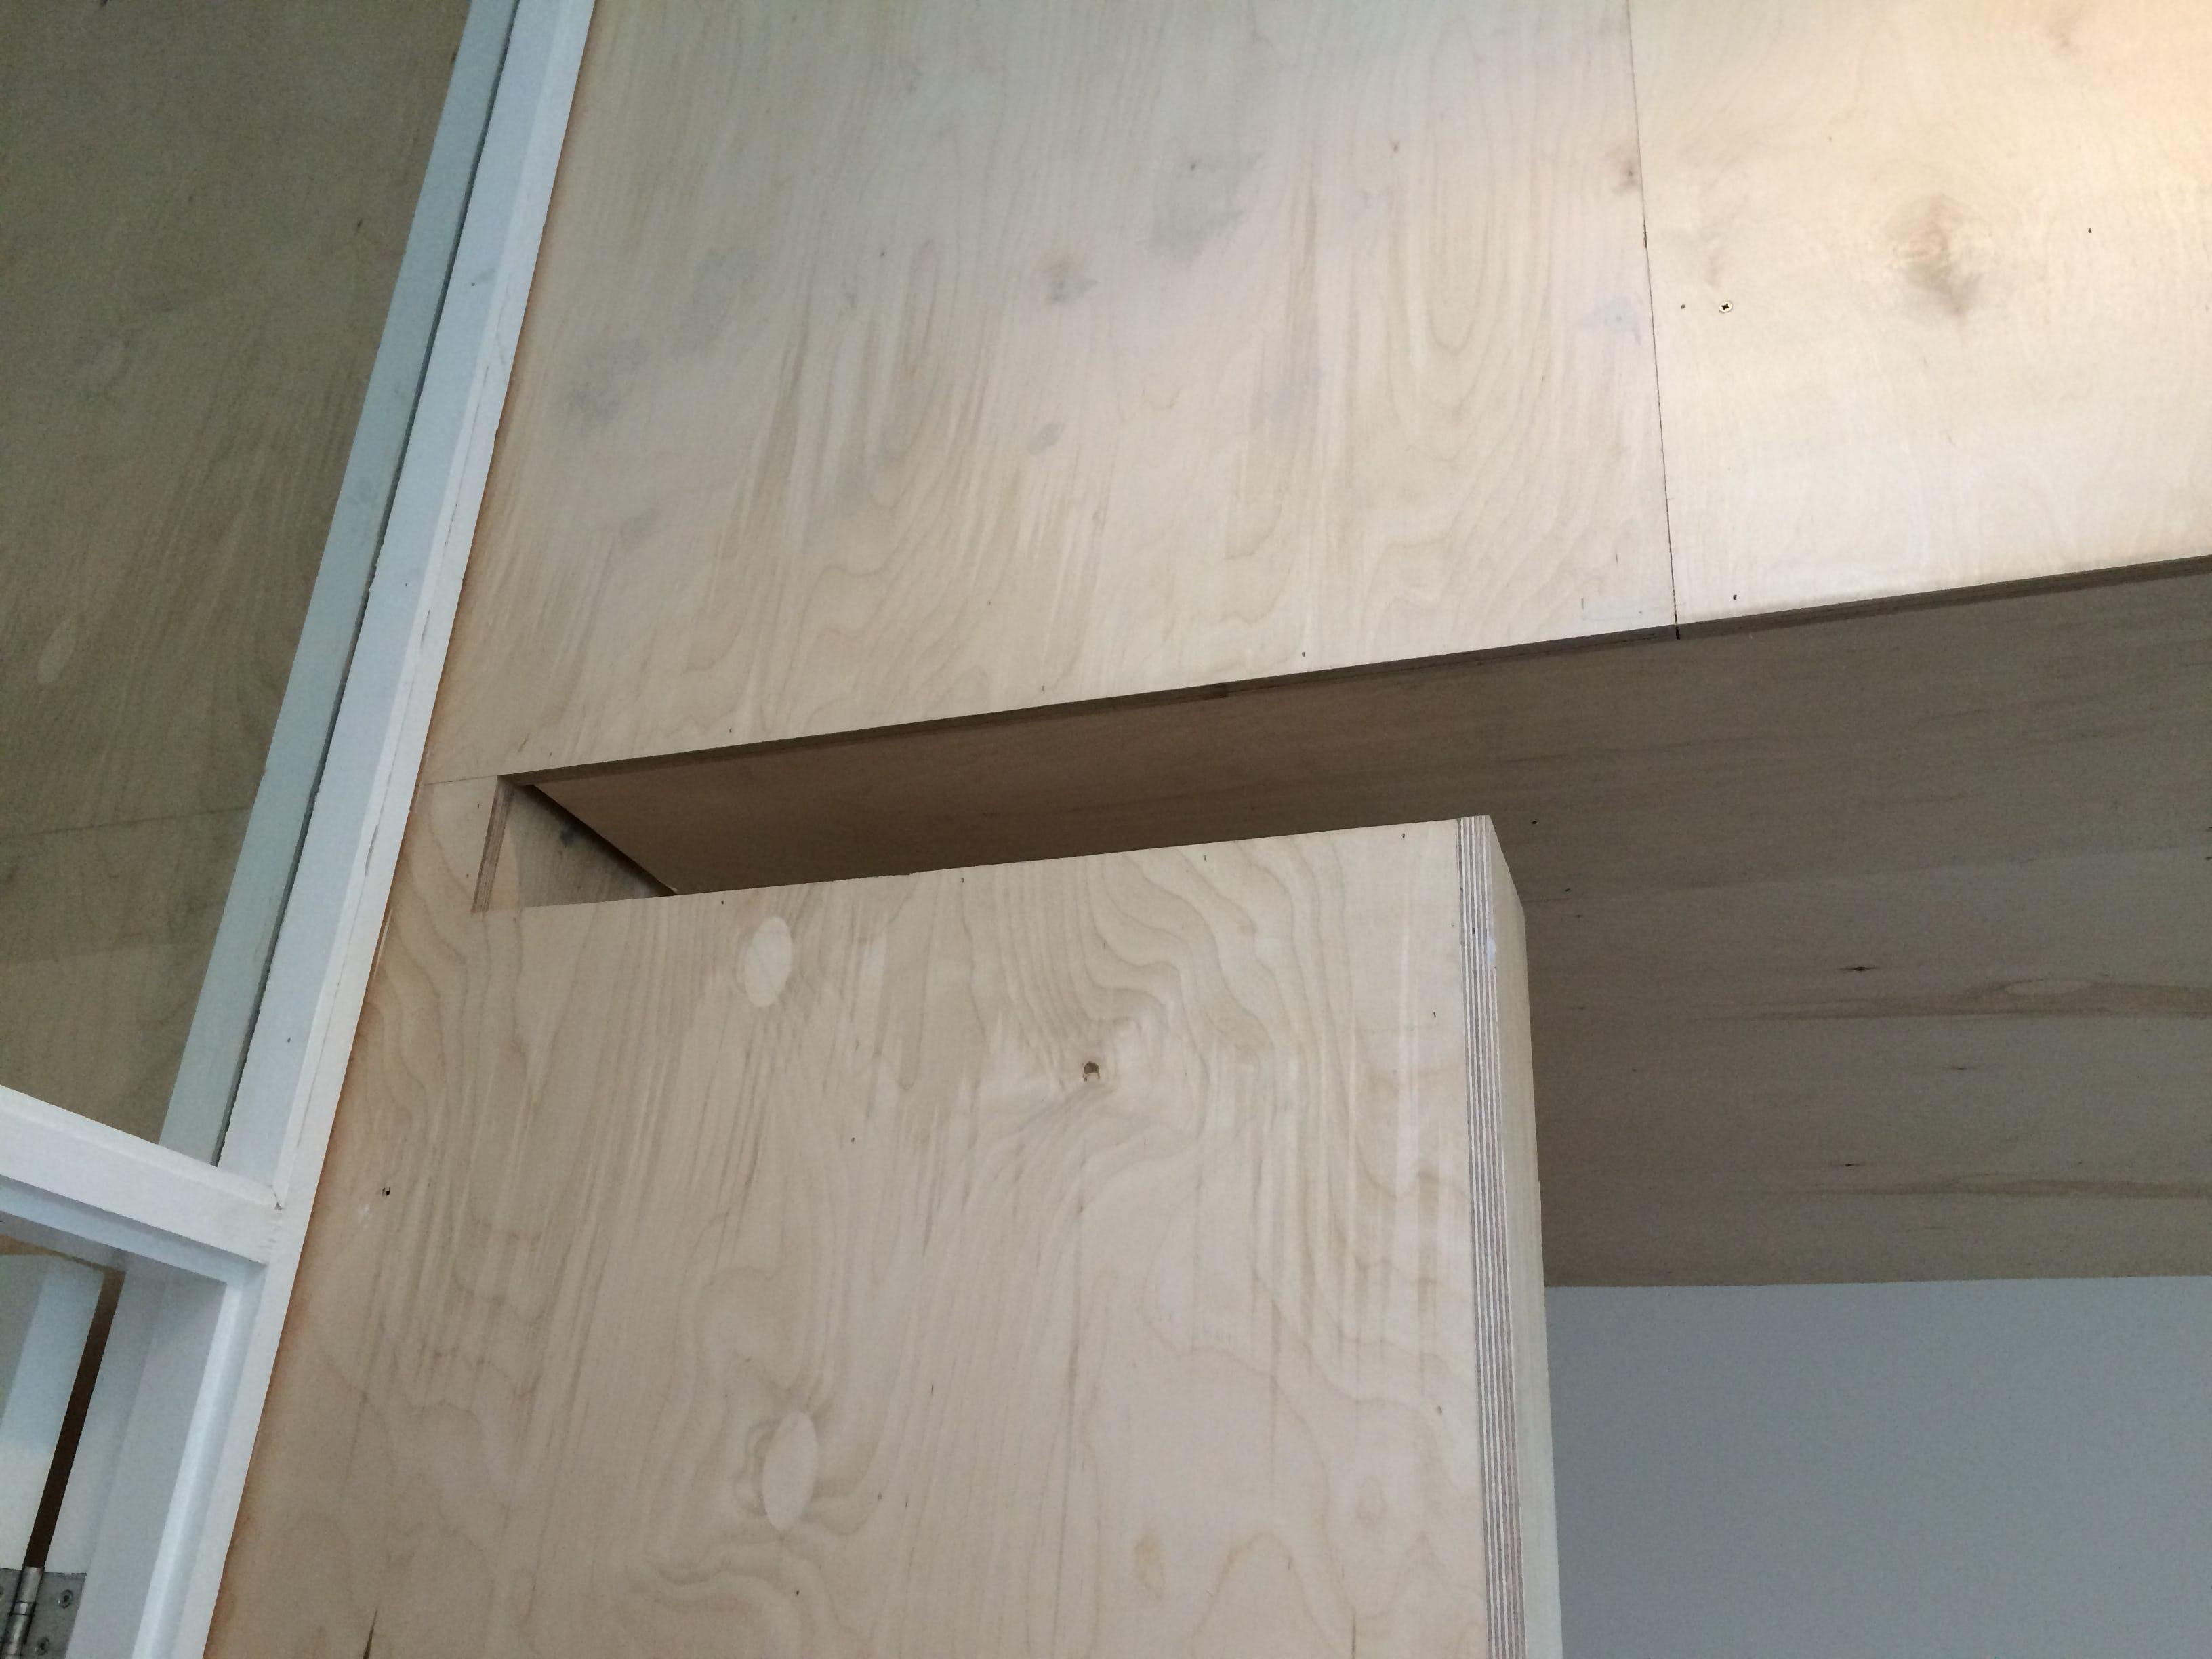 Ply slot detail